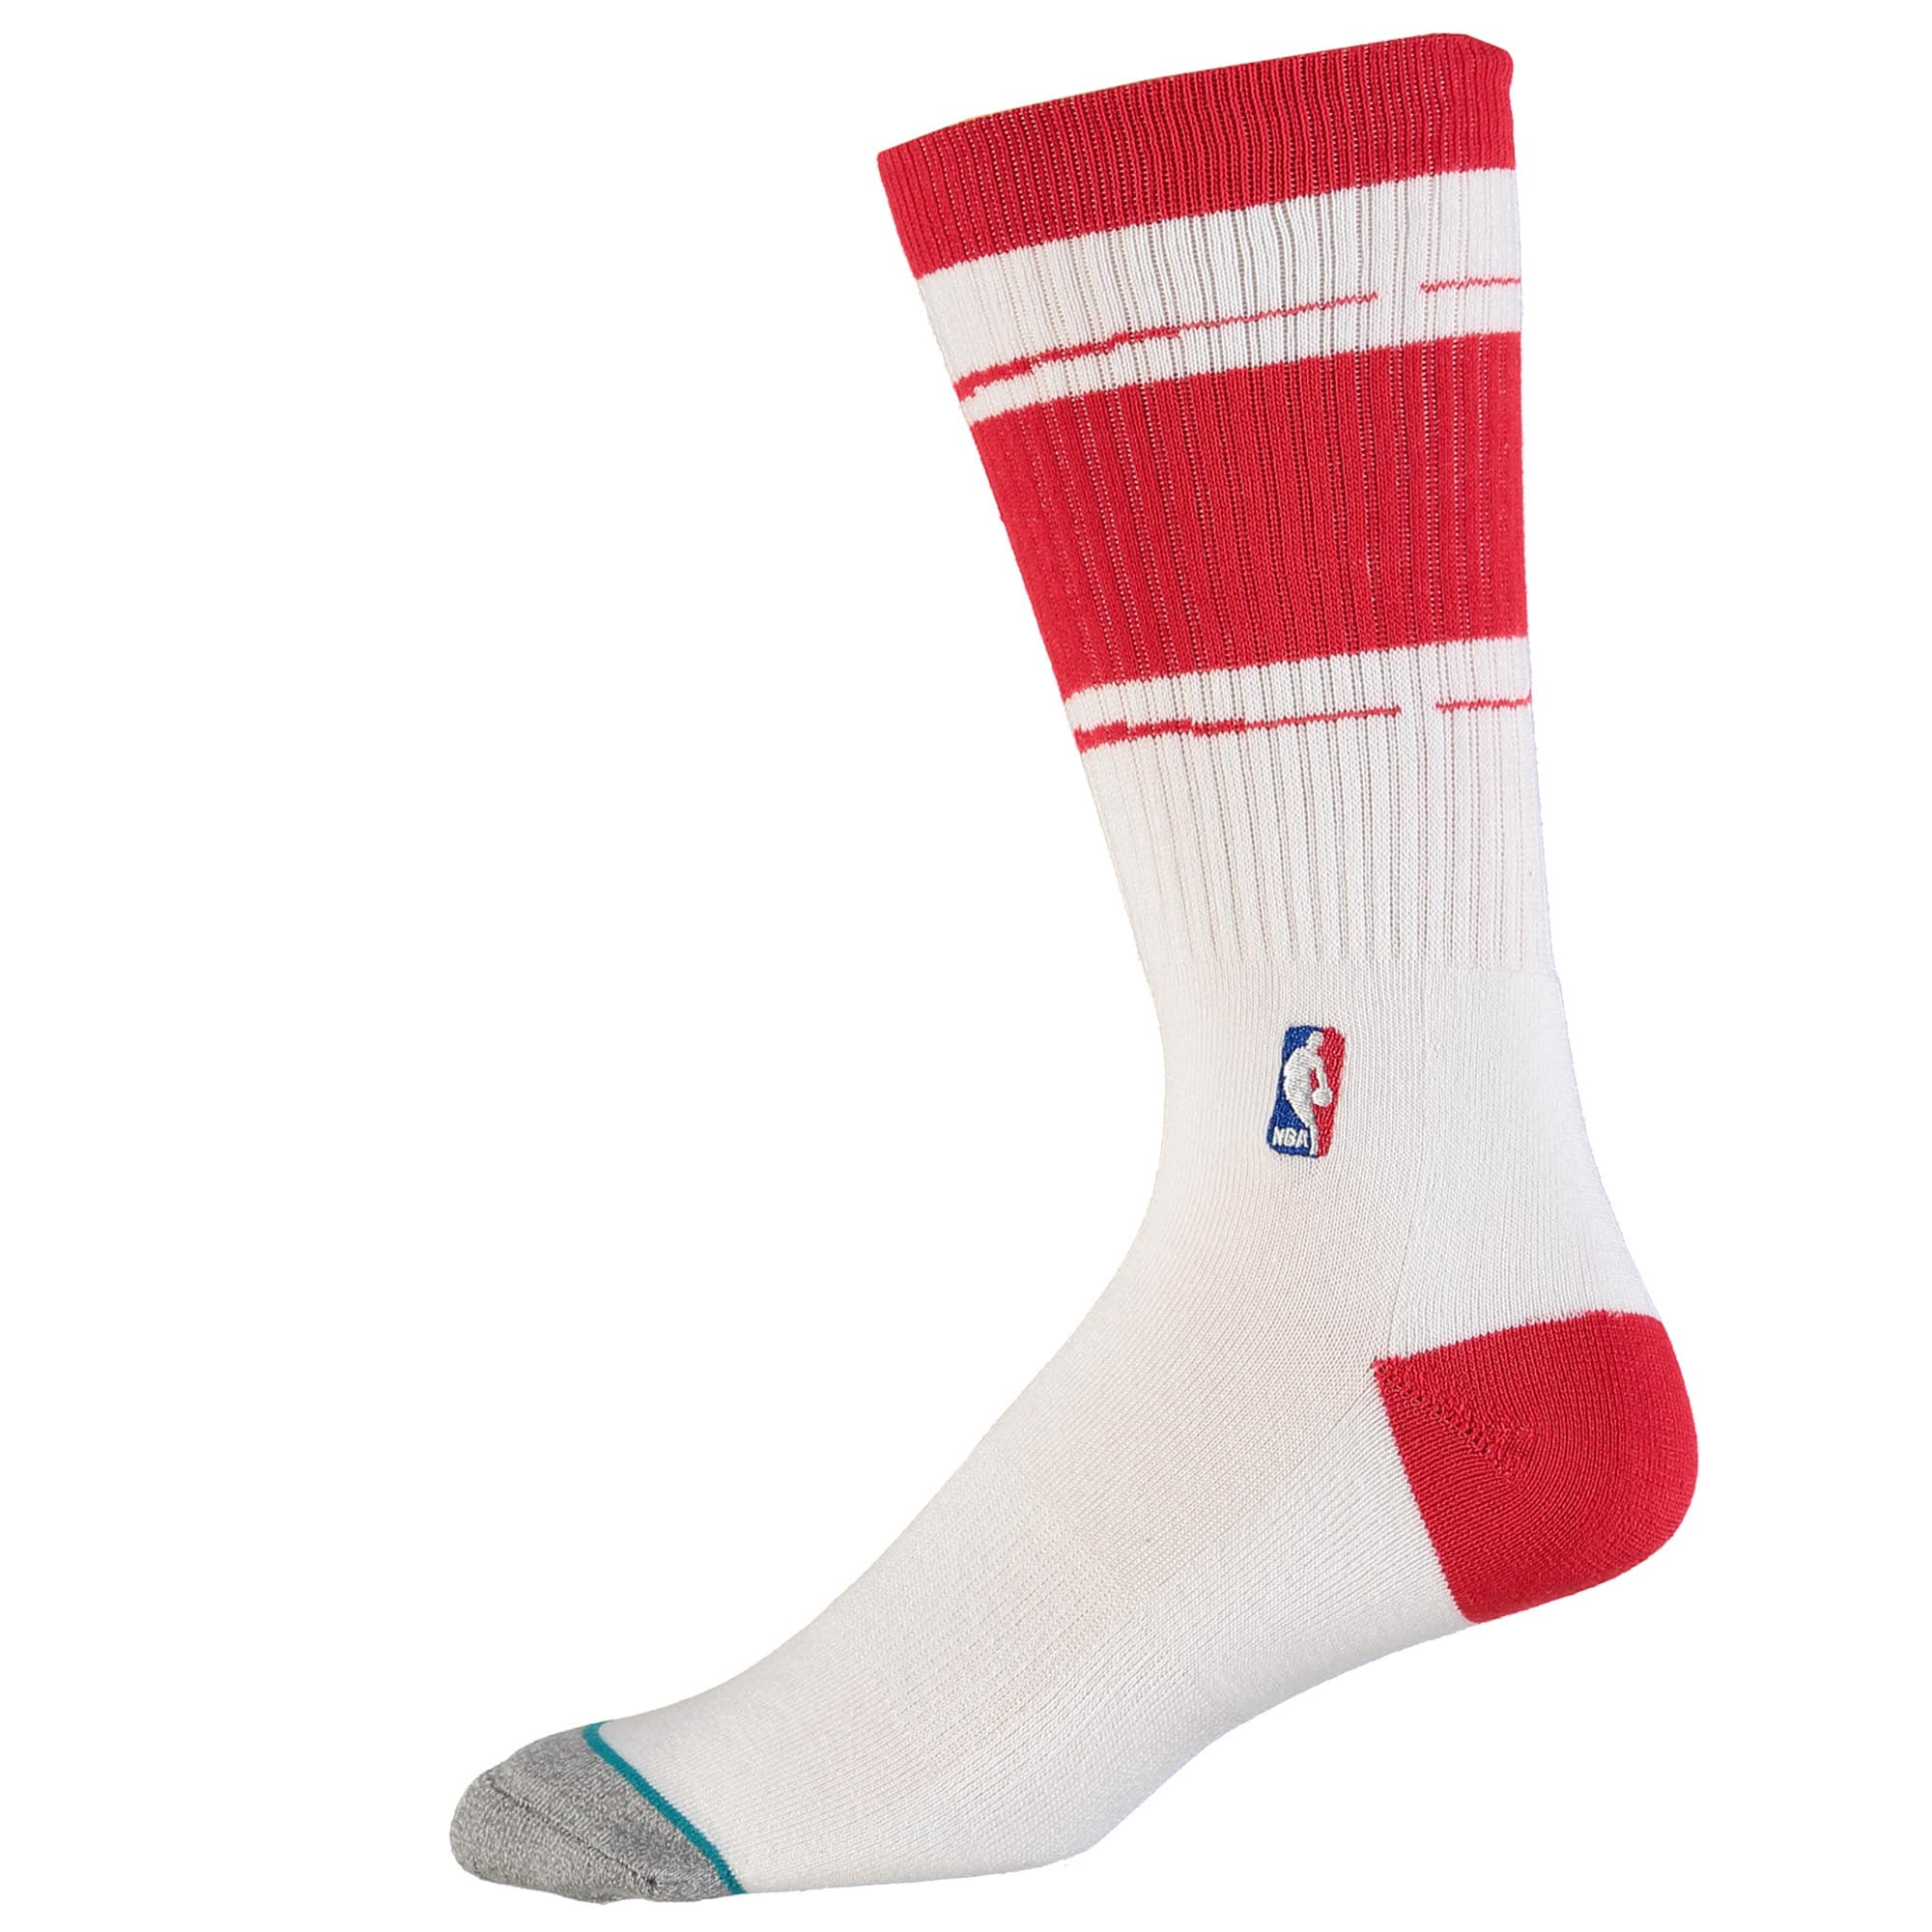 Houston Rockets Stance Arena Core Socks - White